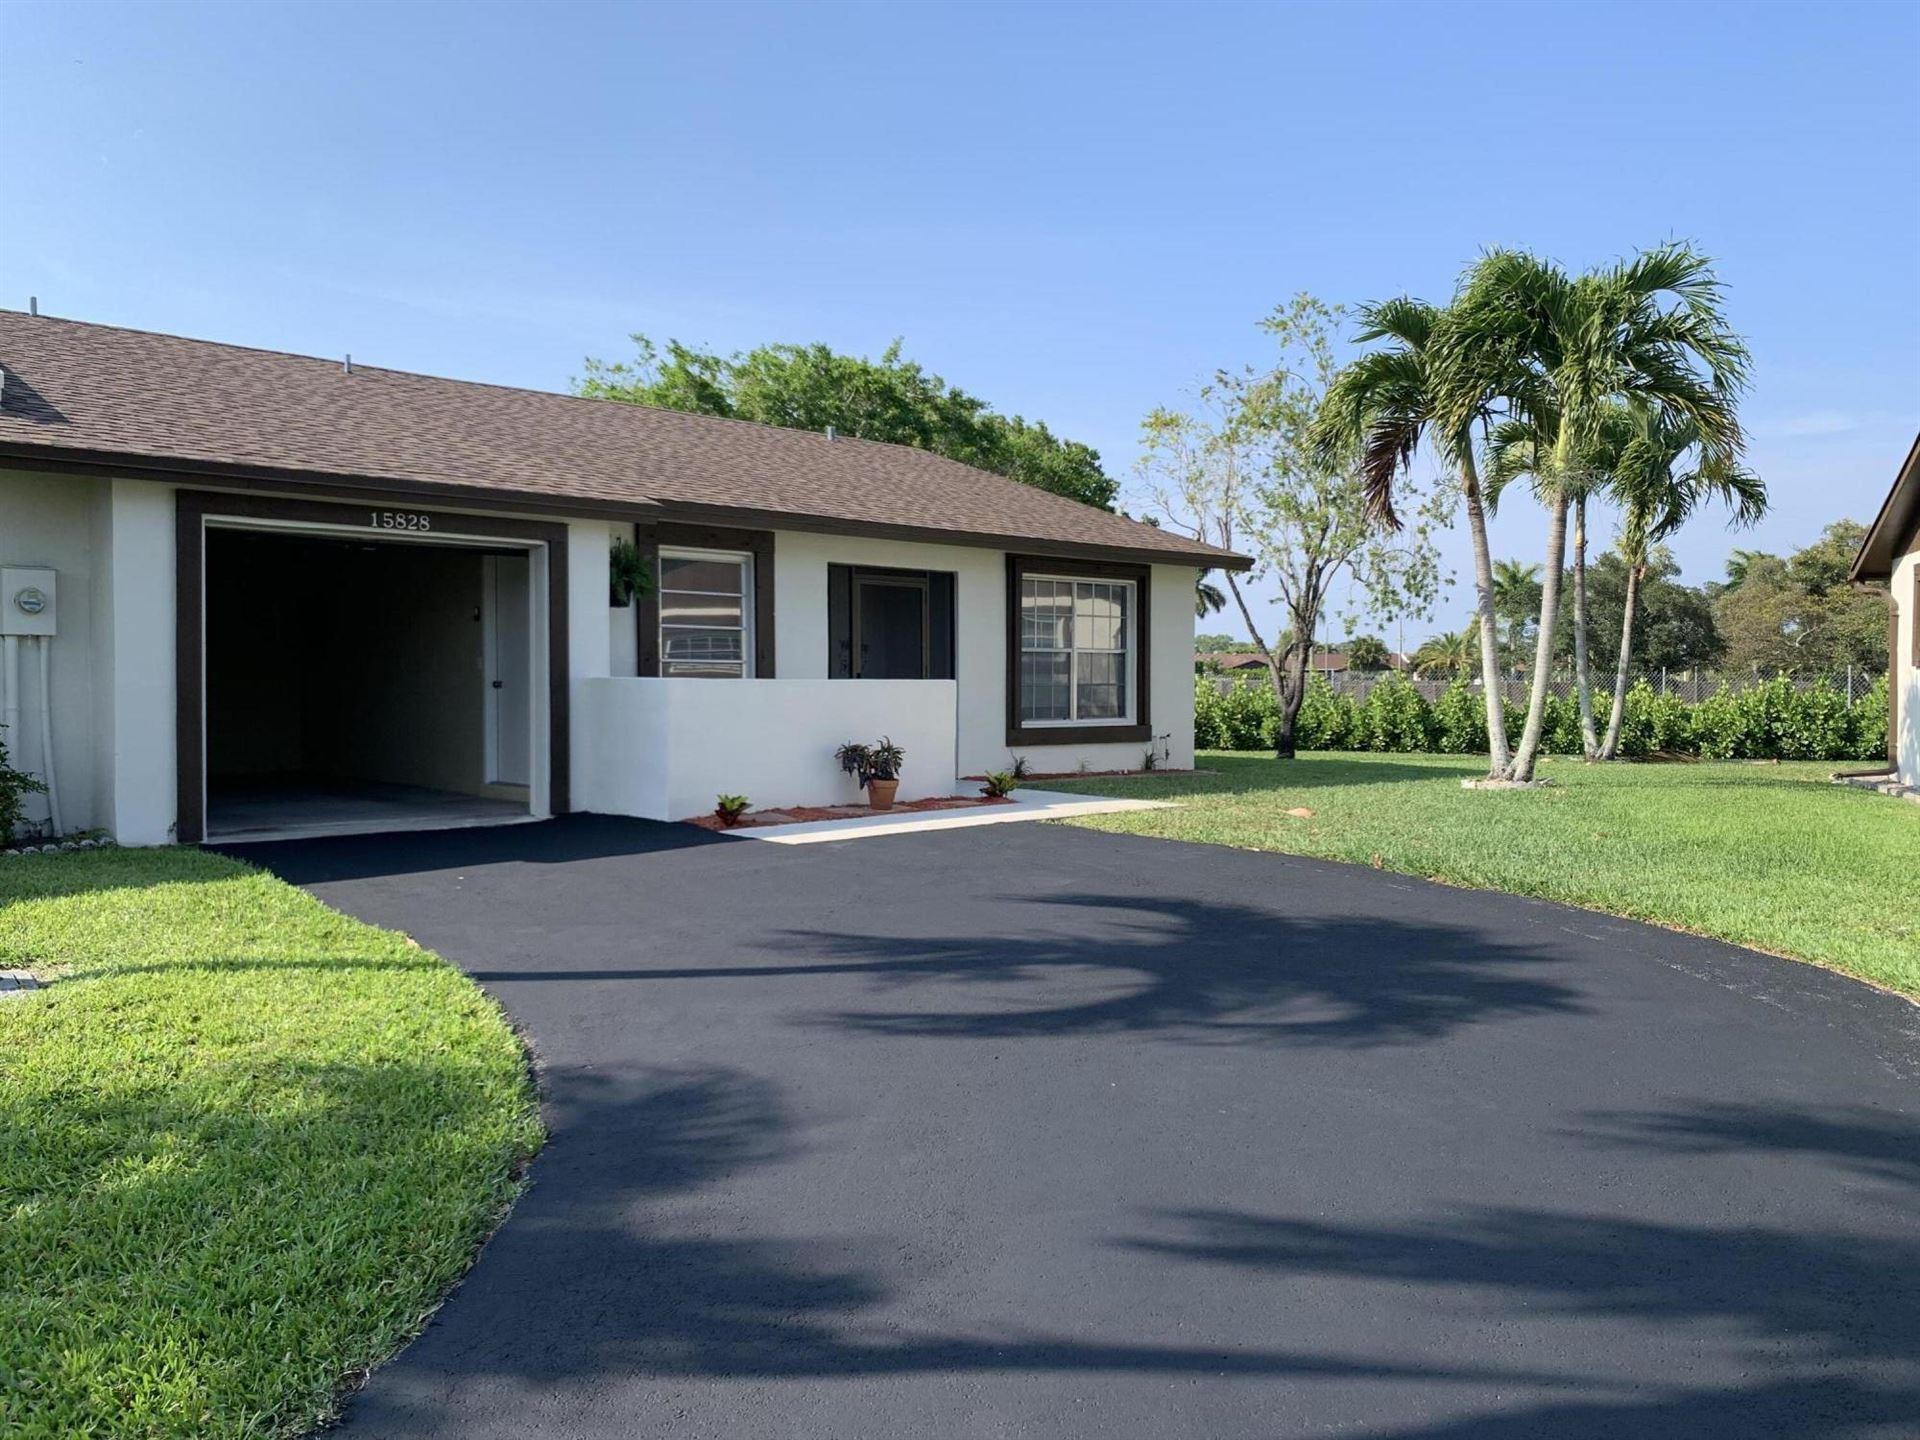 15828 Forsythia Circle, Delray Beach, FL 33484 - MLS#: RX-10710140